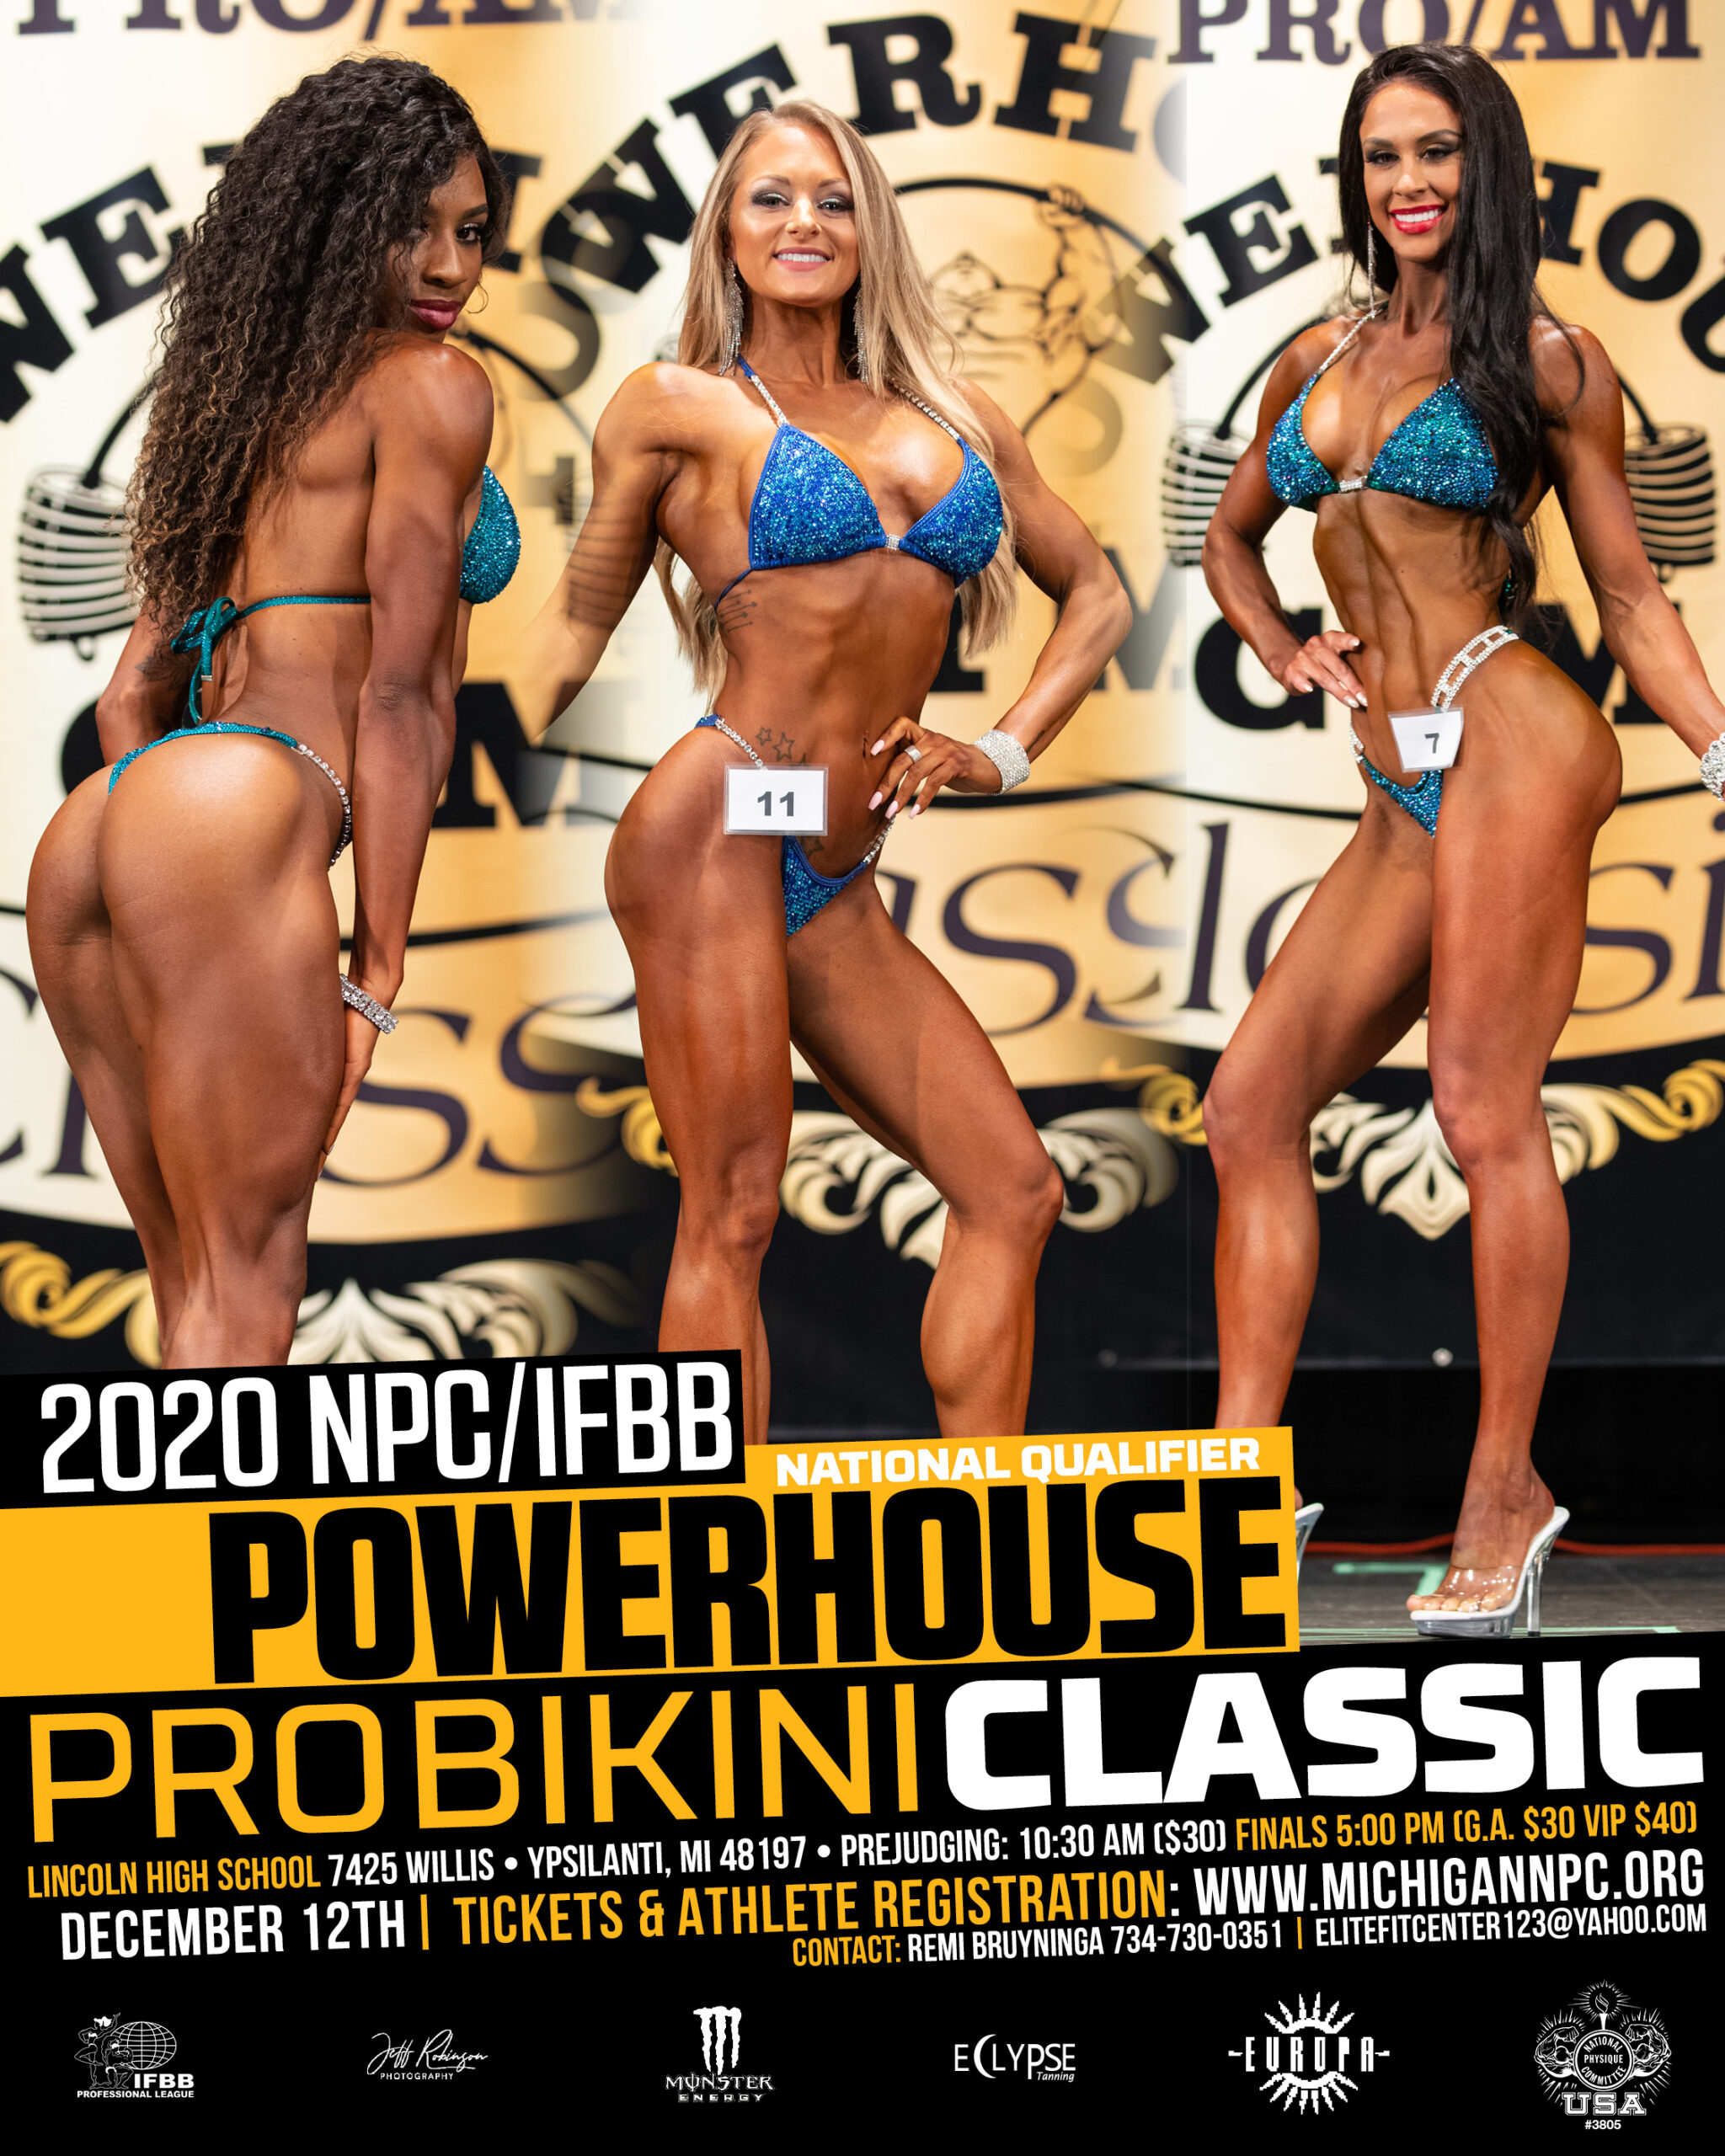 NPC/IFBB Powerhouse Classic Poster